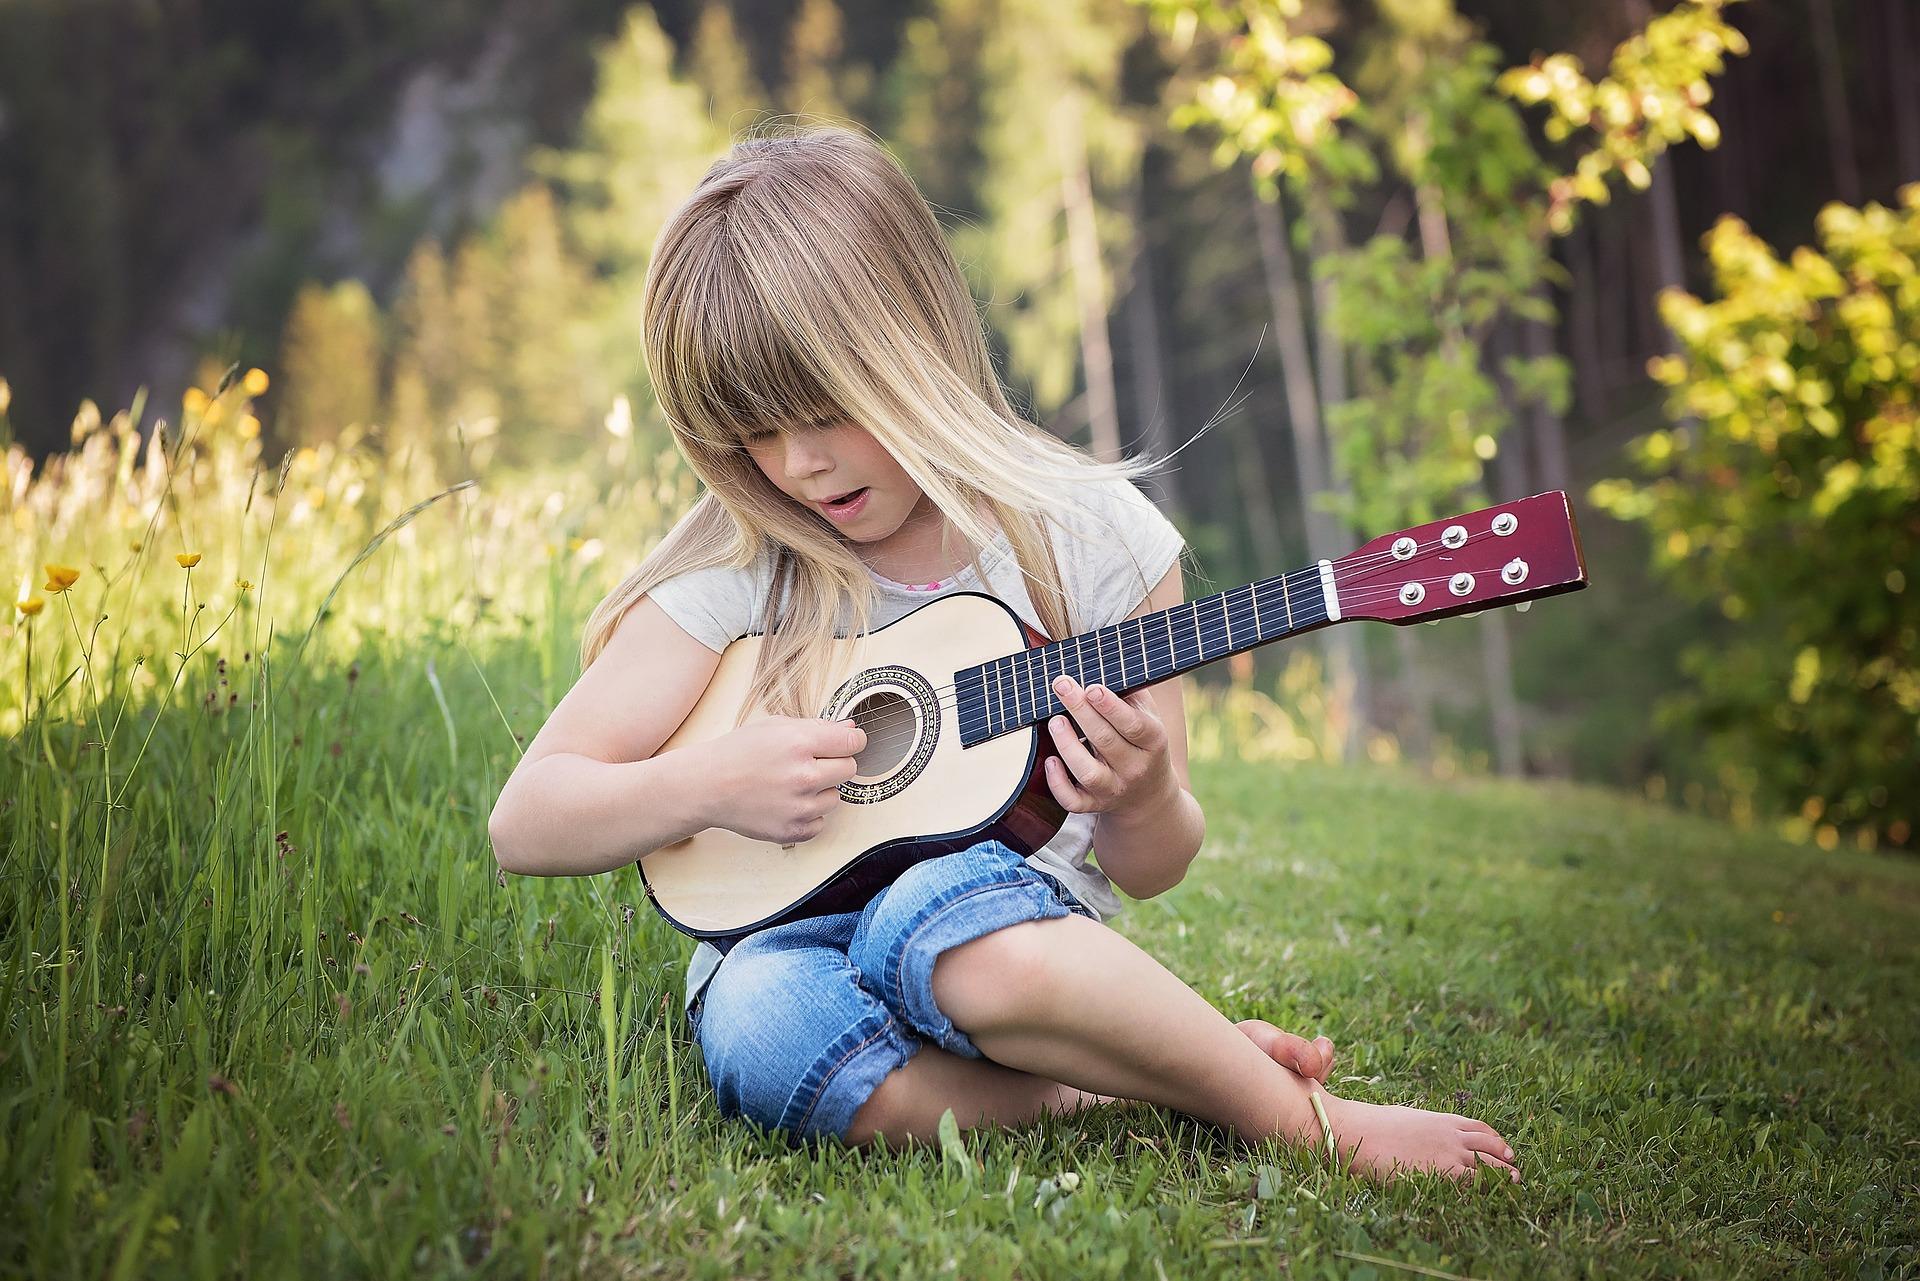 girl guitar - California Weed Blog